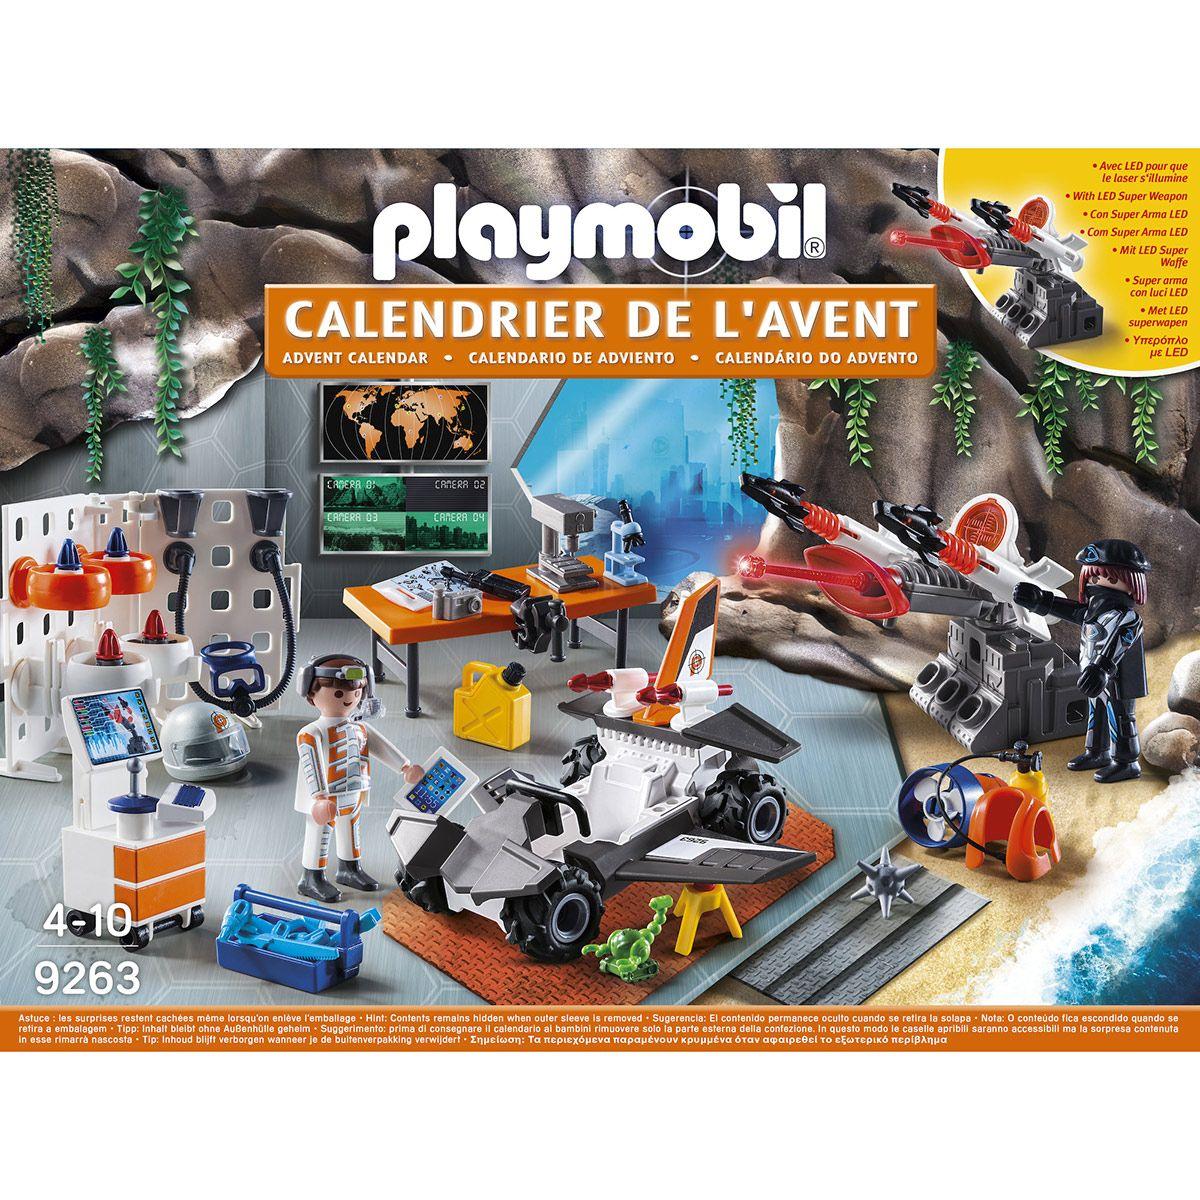 Calendrier L Avent Playmobil.Calendrier De L Avent Playmobil Tops Agents 9263 Vehicules